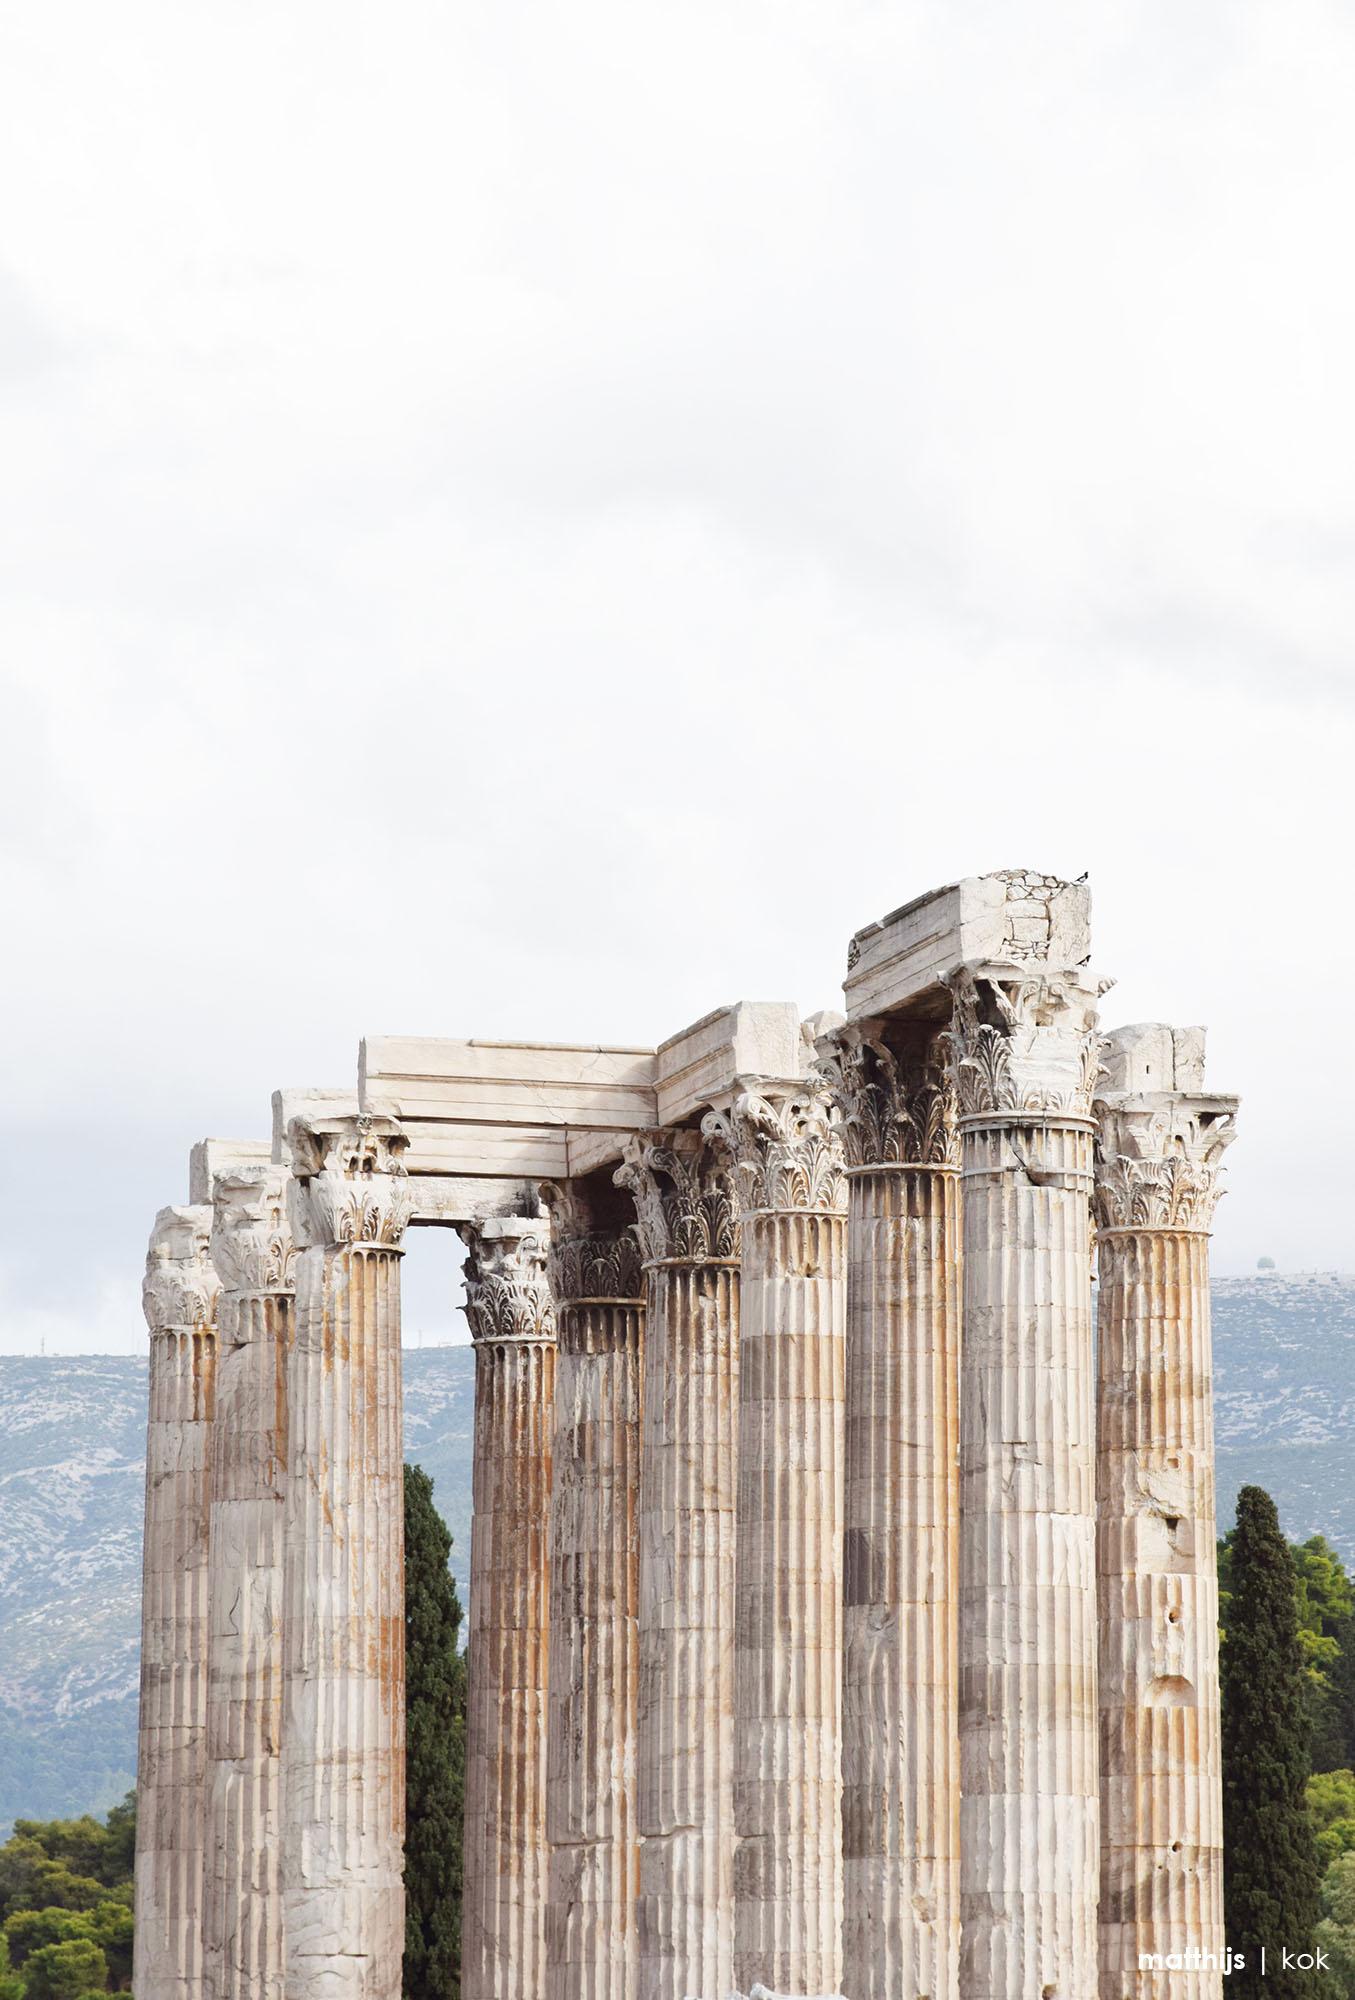 Olympieion, Athens, Greece | Photo by Matthijs Kok